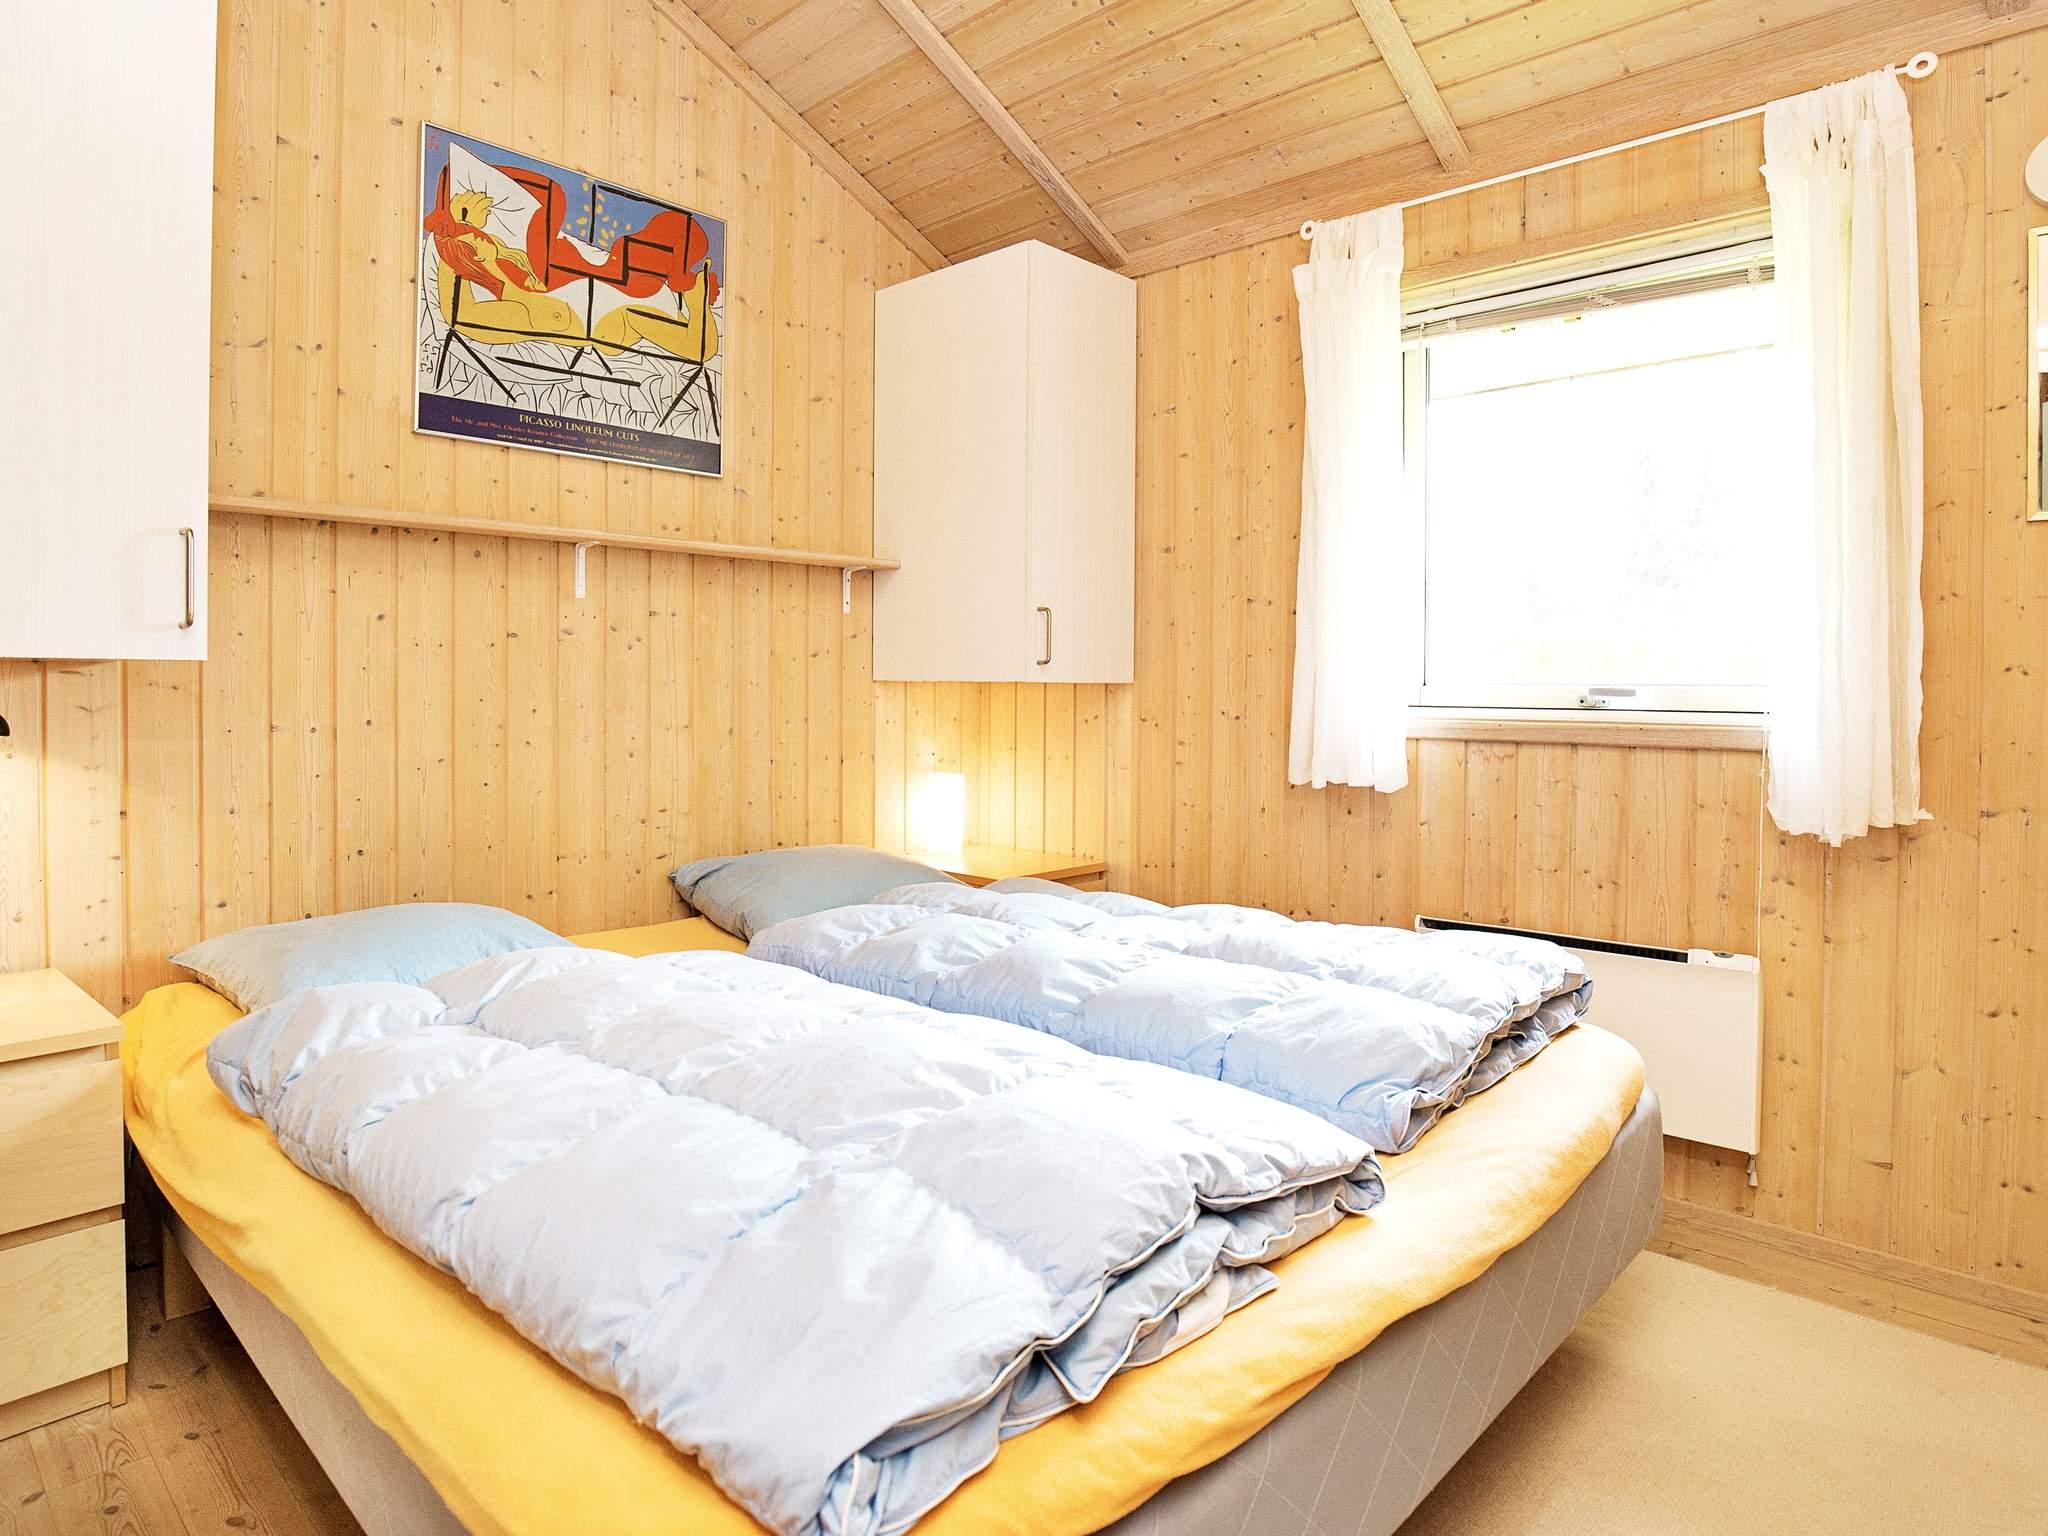 Ferienhaus Hornbæk (87412), Hornbæk, , Nordseeland, Dänemark, Bild 11